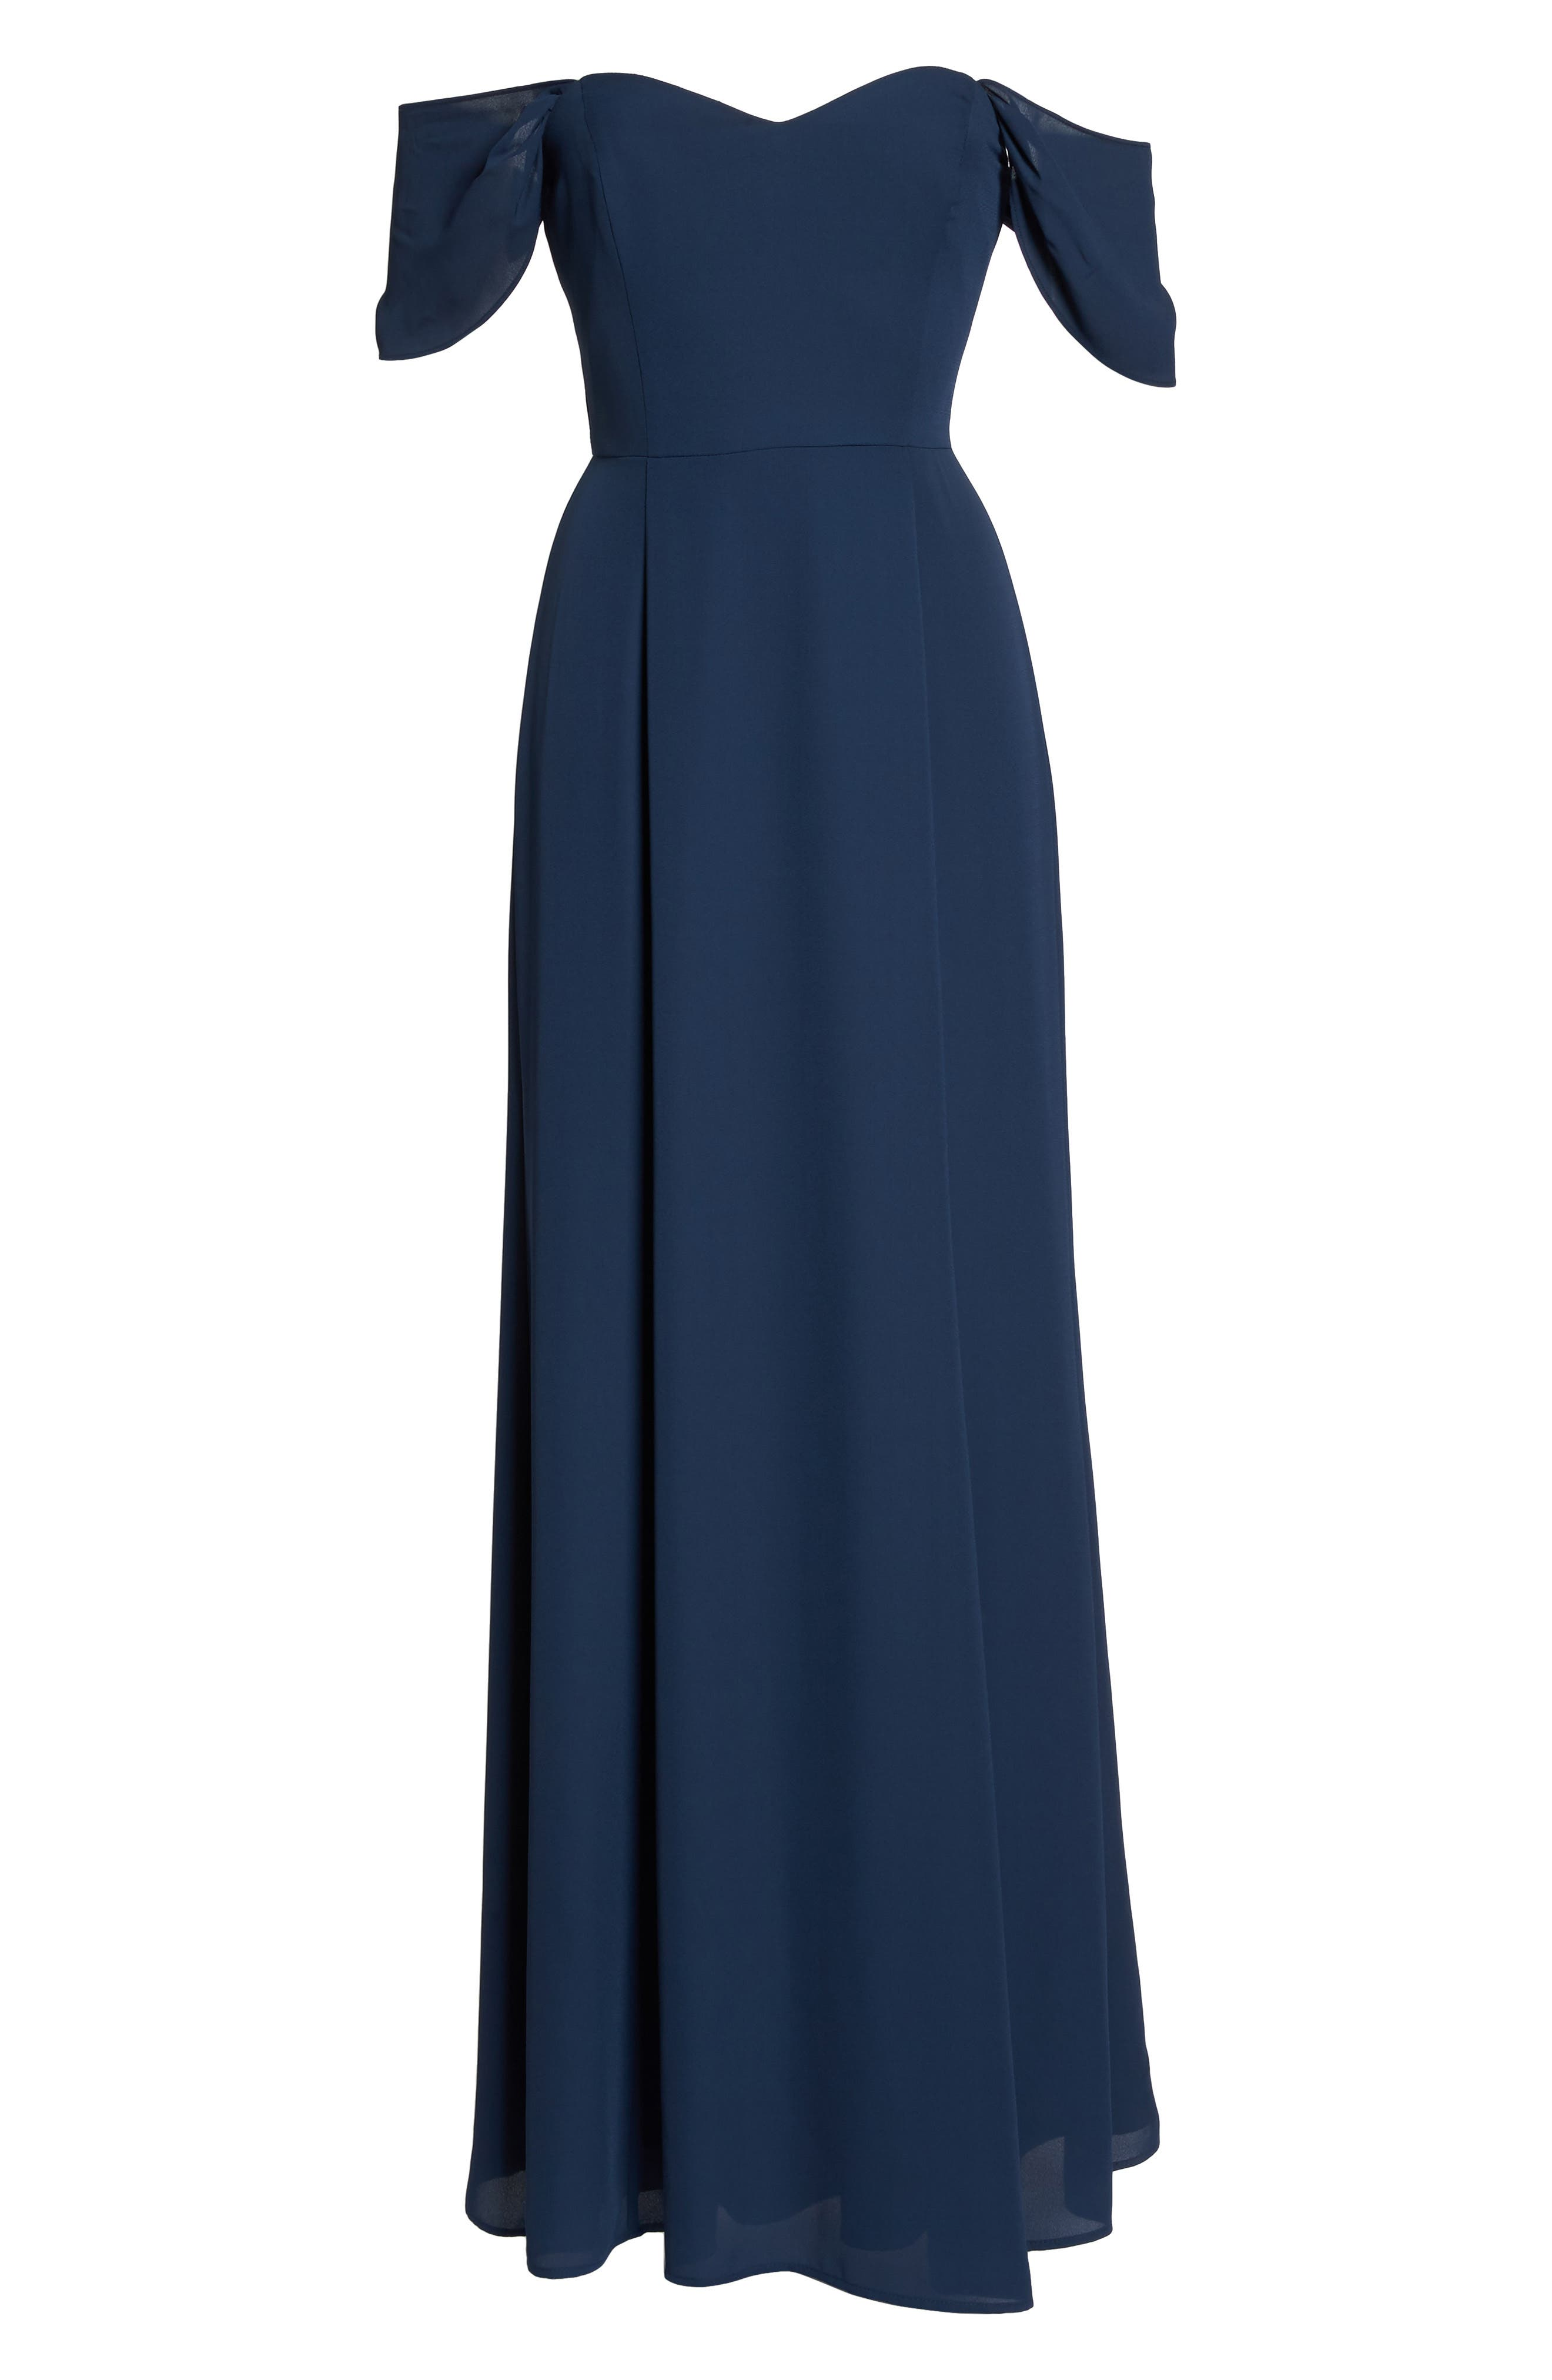 Rachel Off the Shoulder Gored Maxi Dress,                             Alternate thumbnail 12, color,